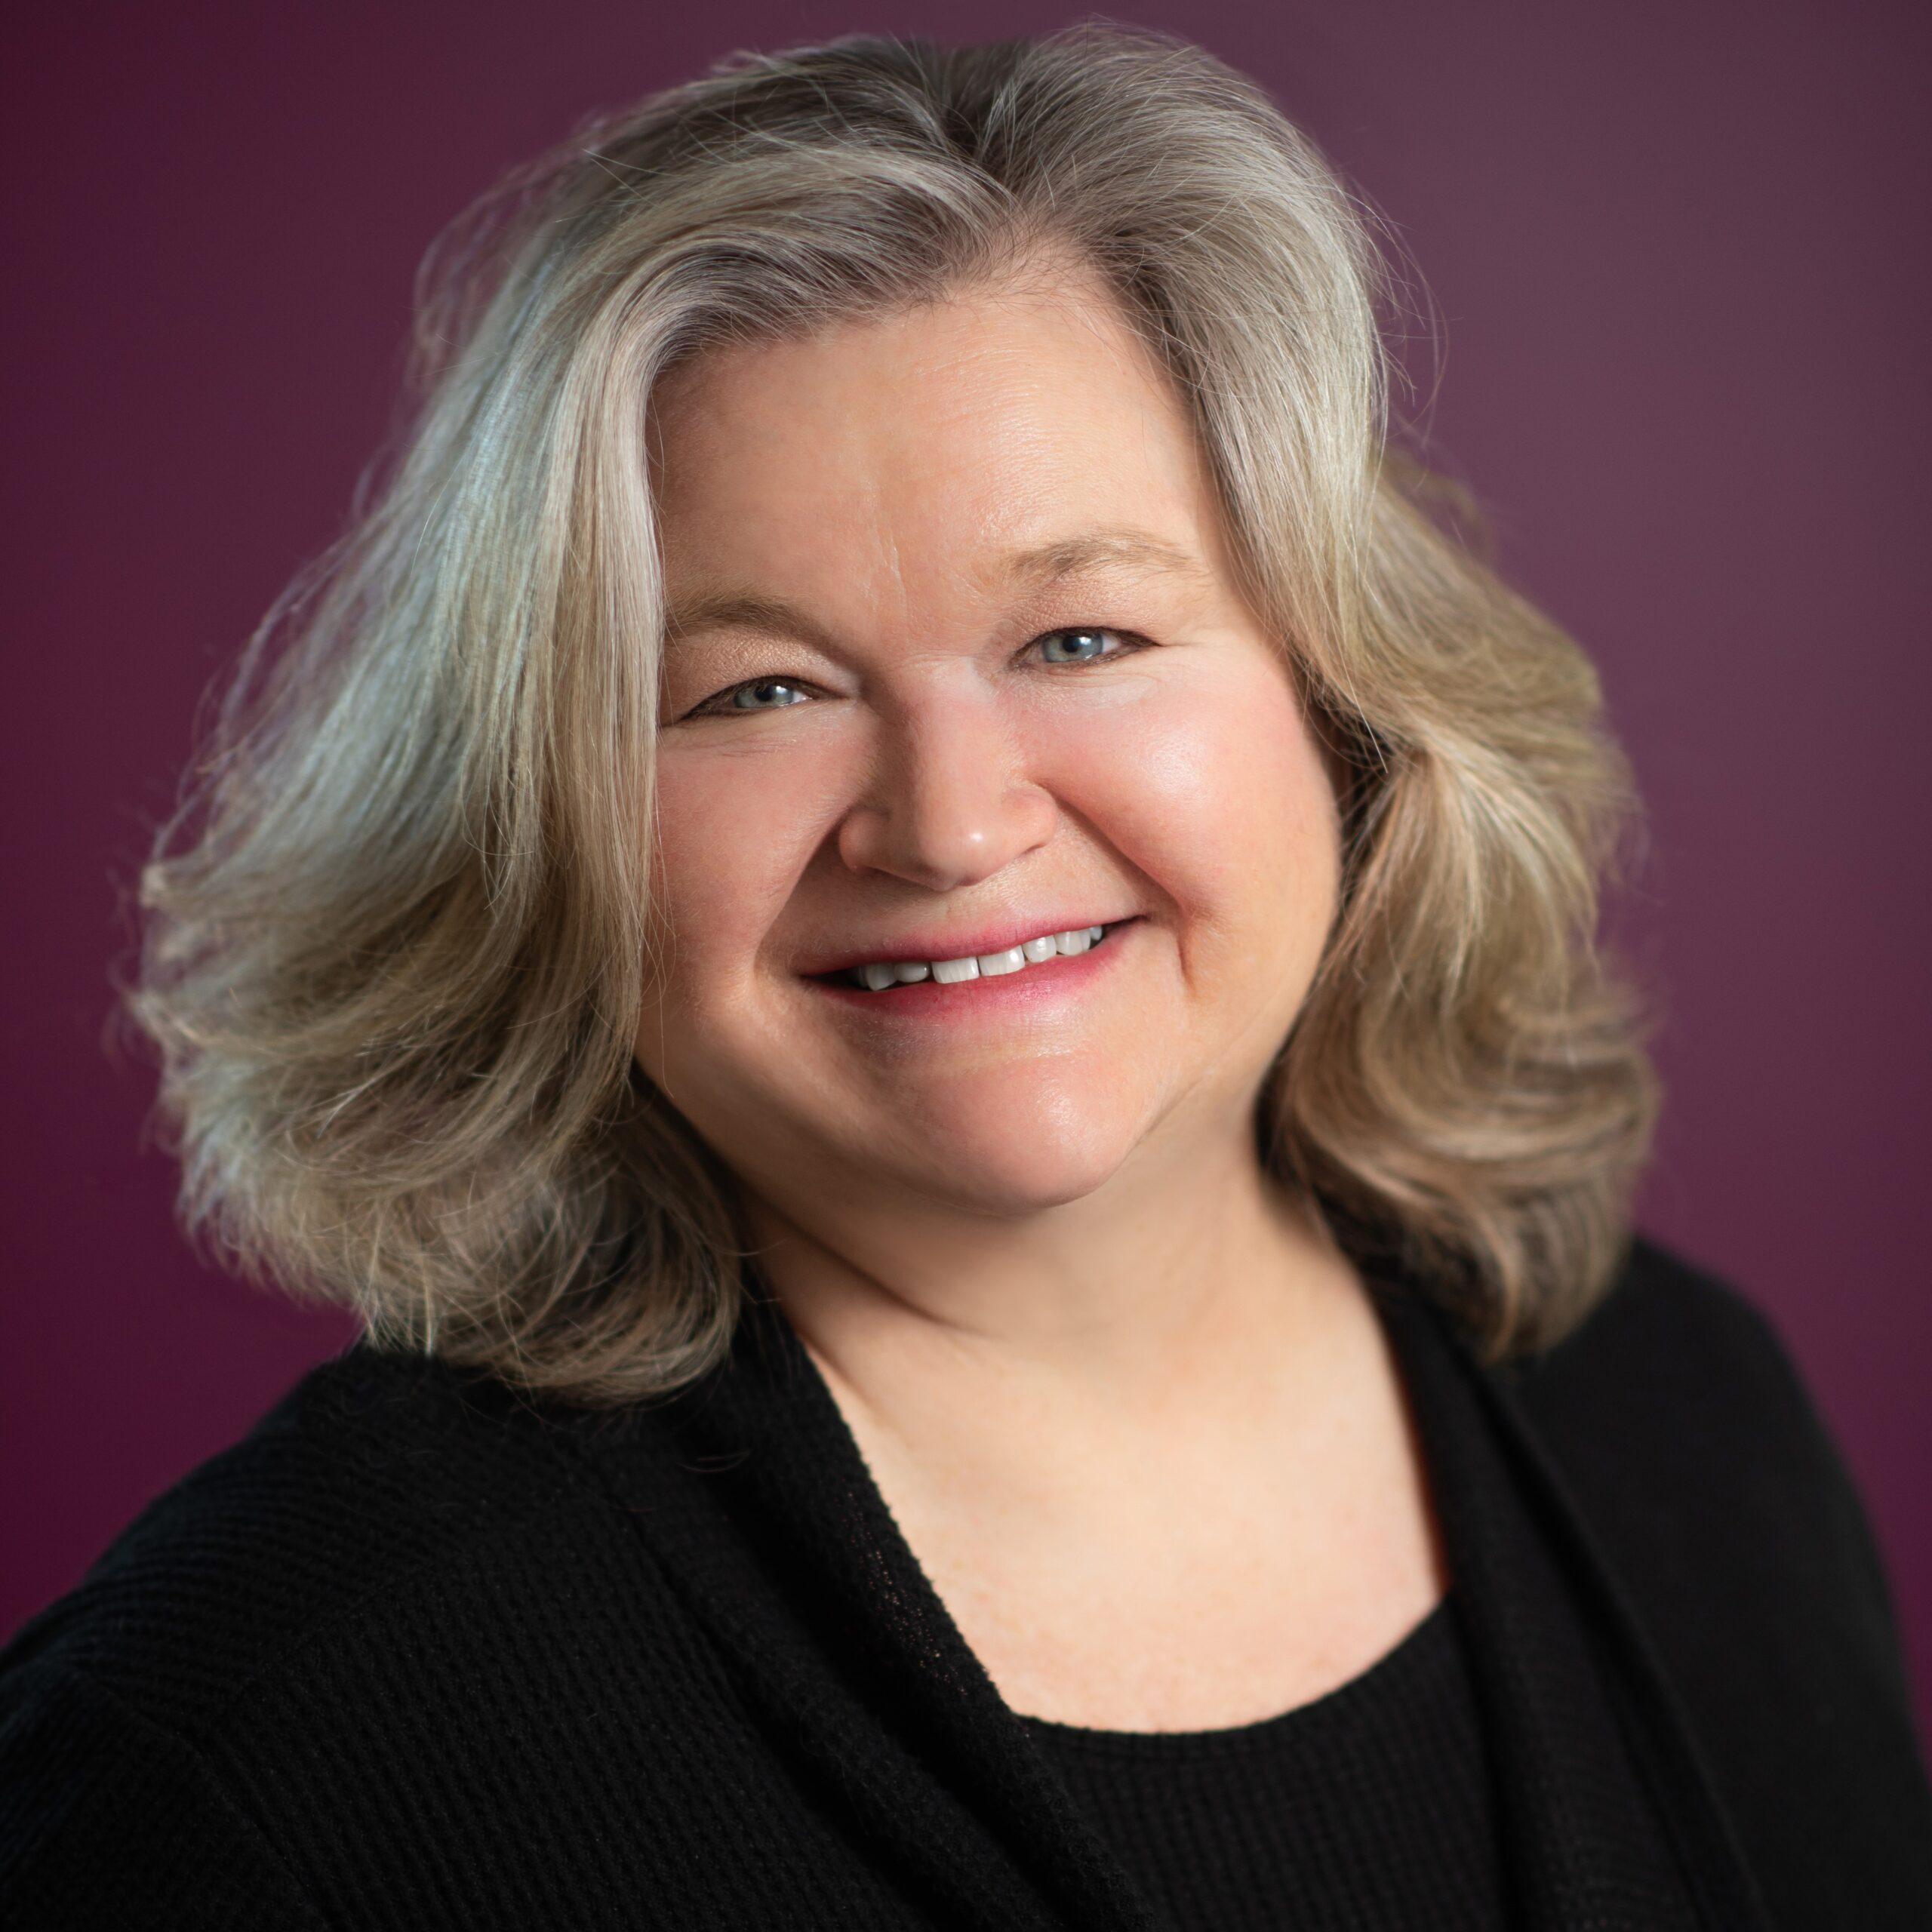 Michelle Witte, League of Women Voters